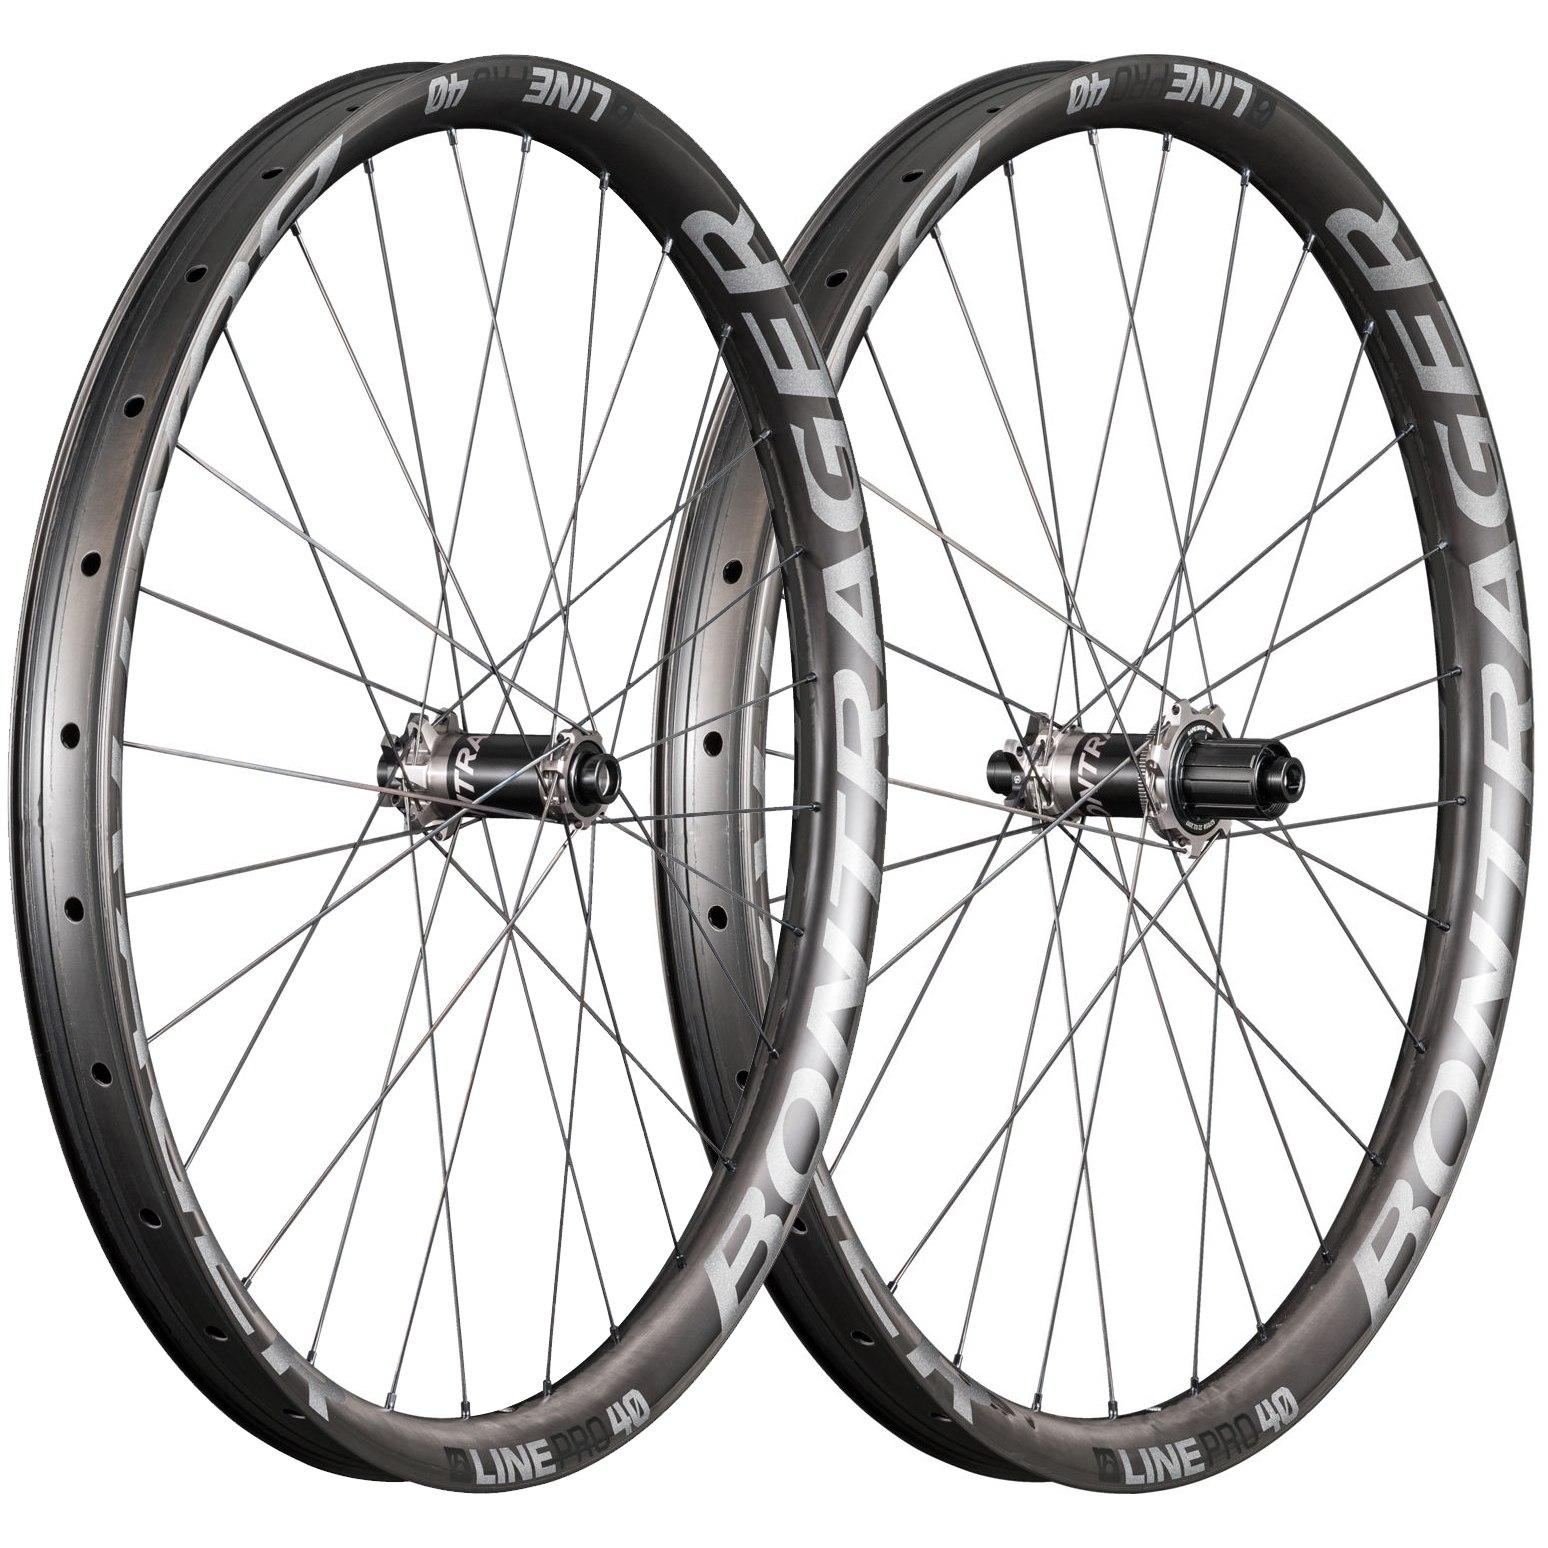 "Bontrager Line Pro 40 TLR Boost 27,5"" Wheelset - 6-Bolt - FW: 15x110mm   RW: 12x148mm Boost"